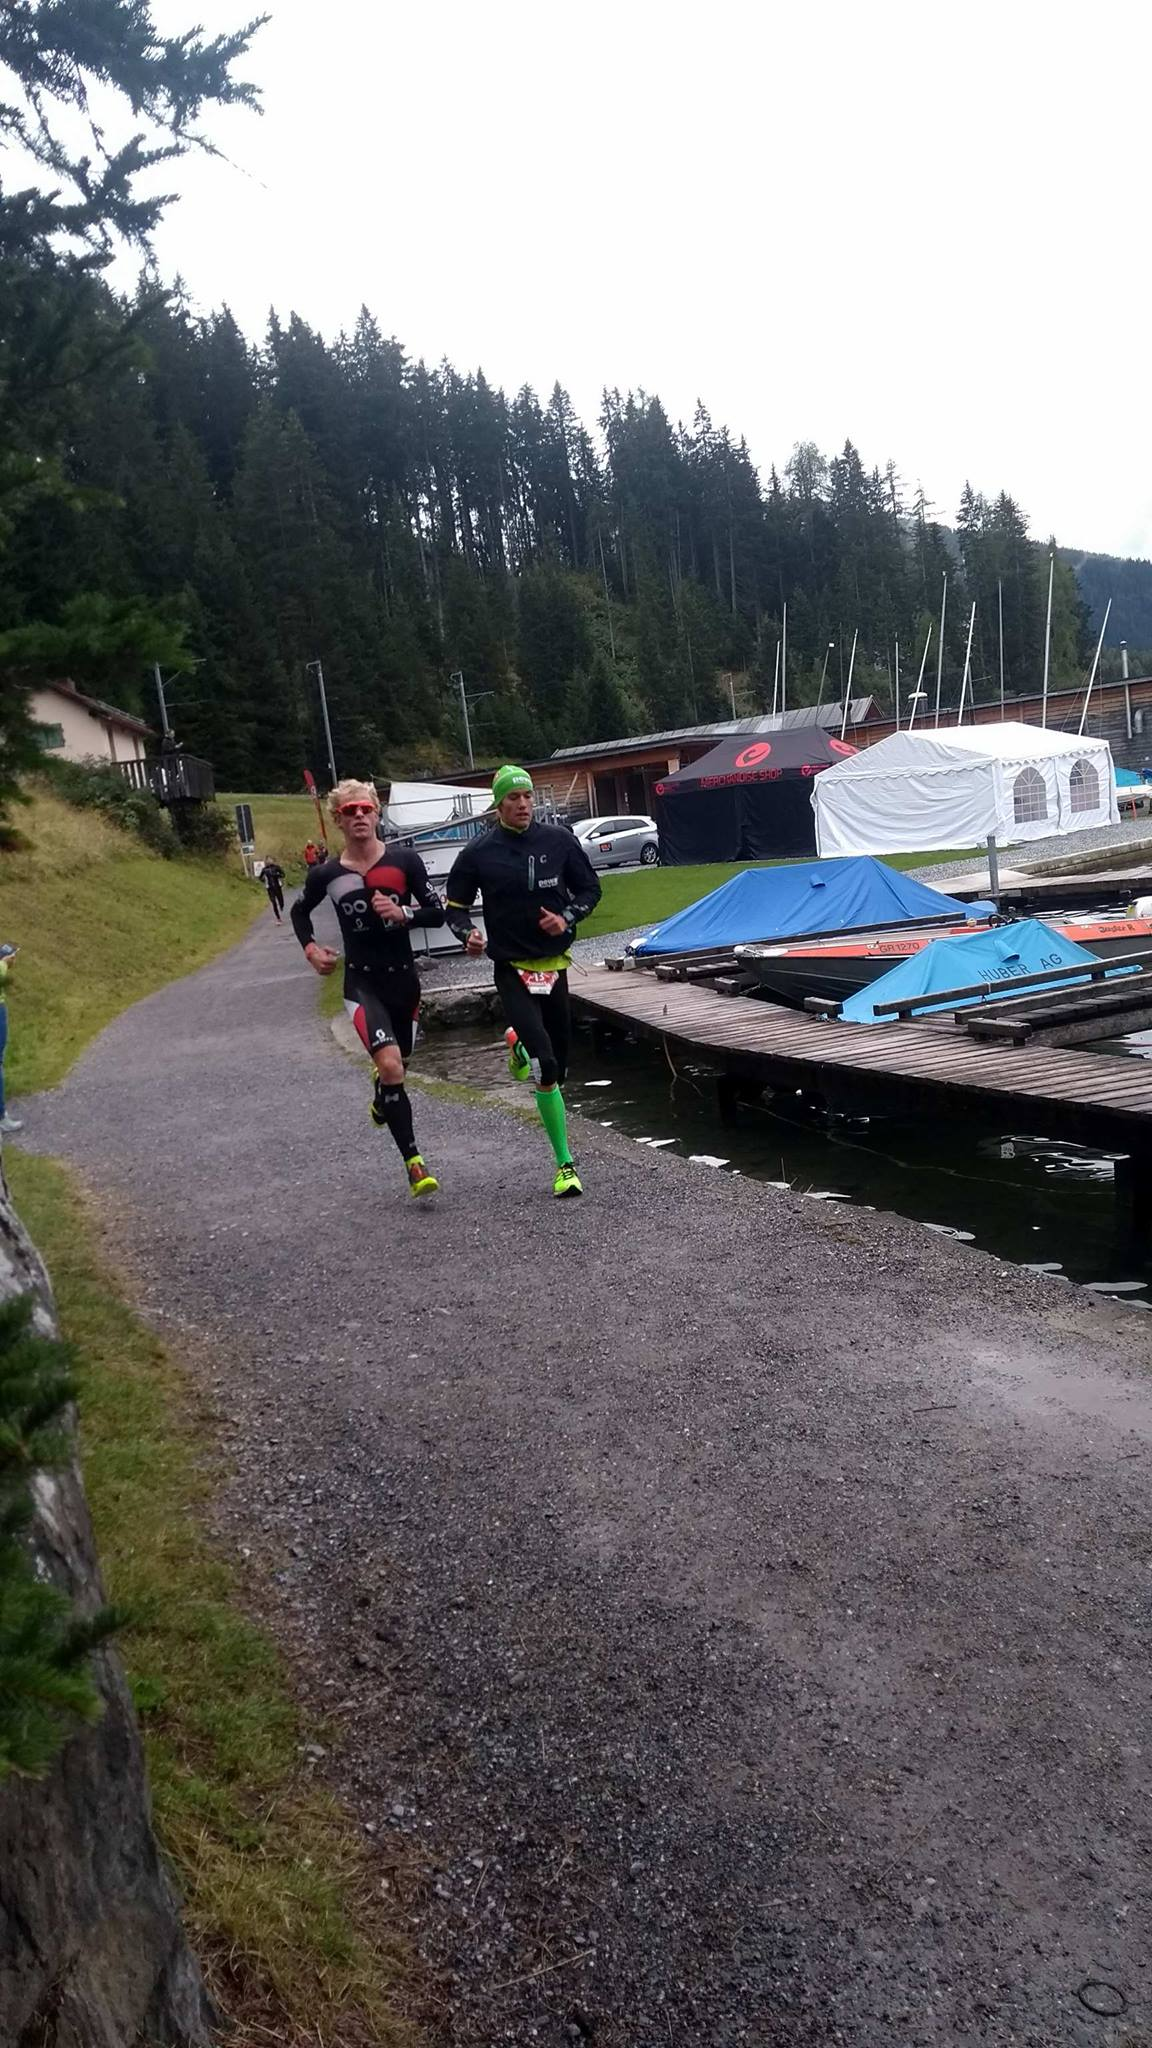 Pieter heemeryck run Challenge Davos